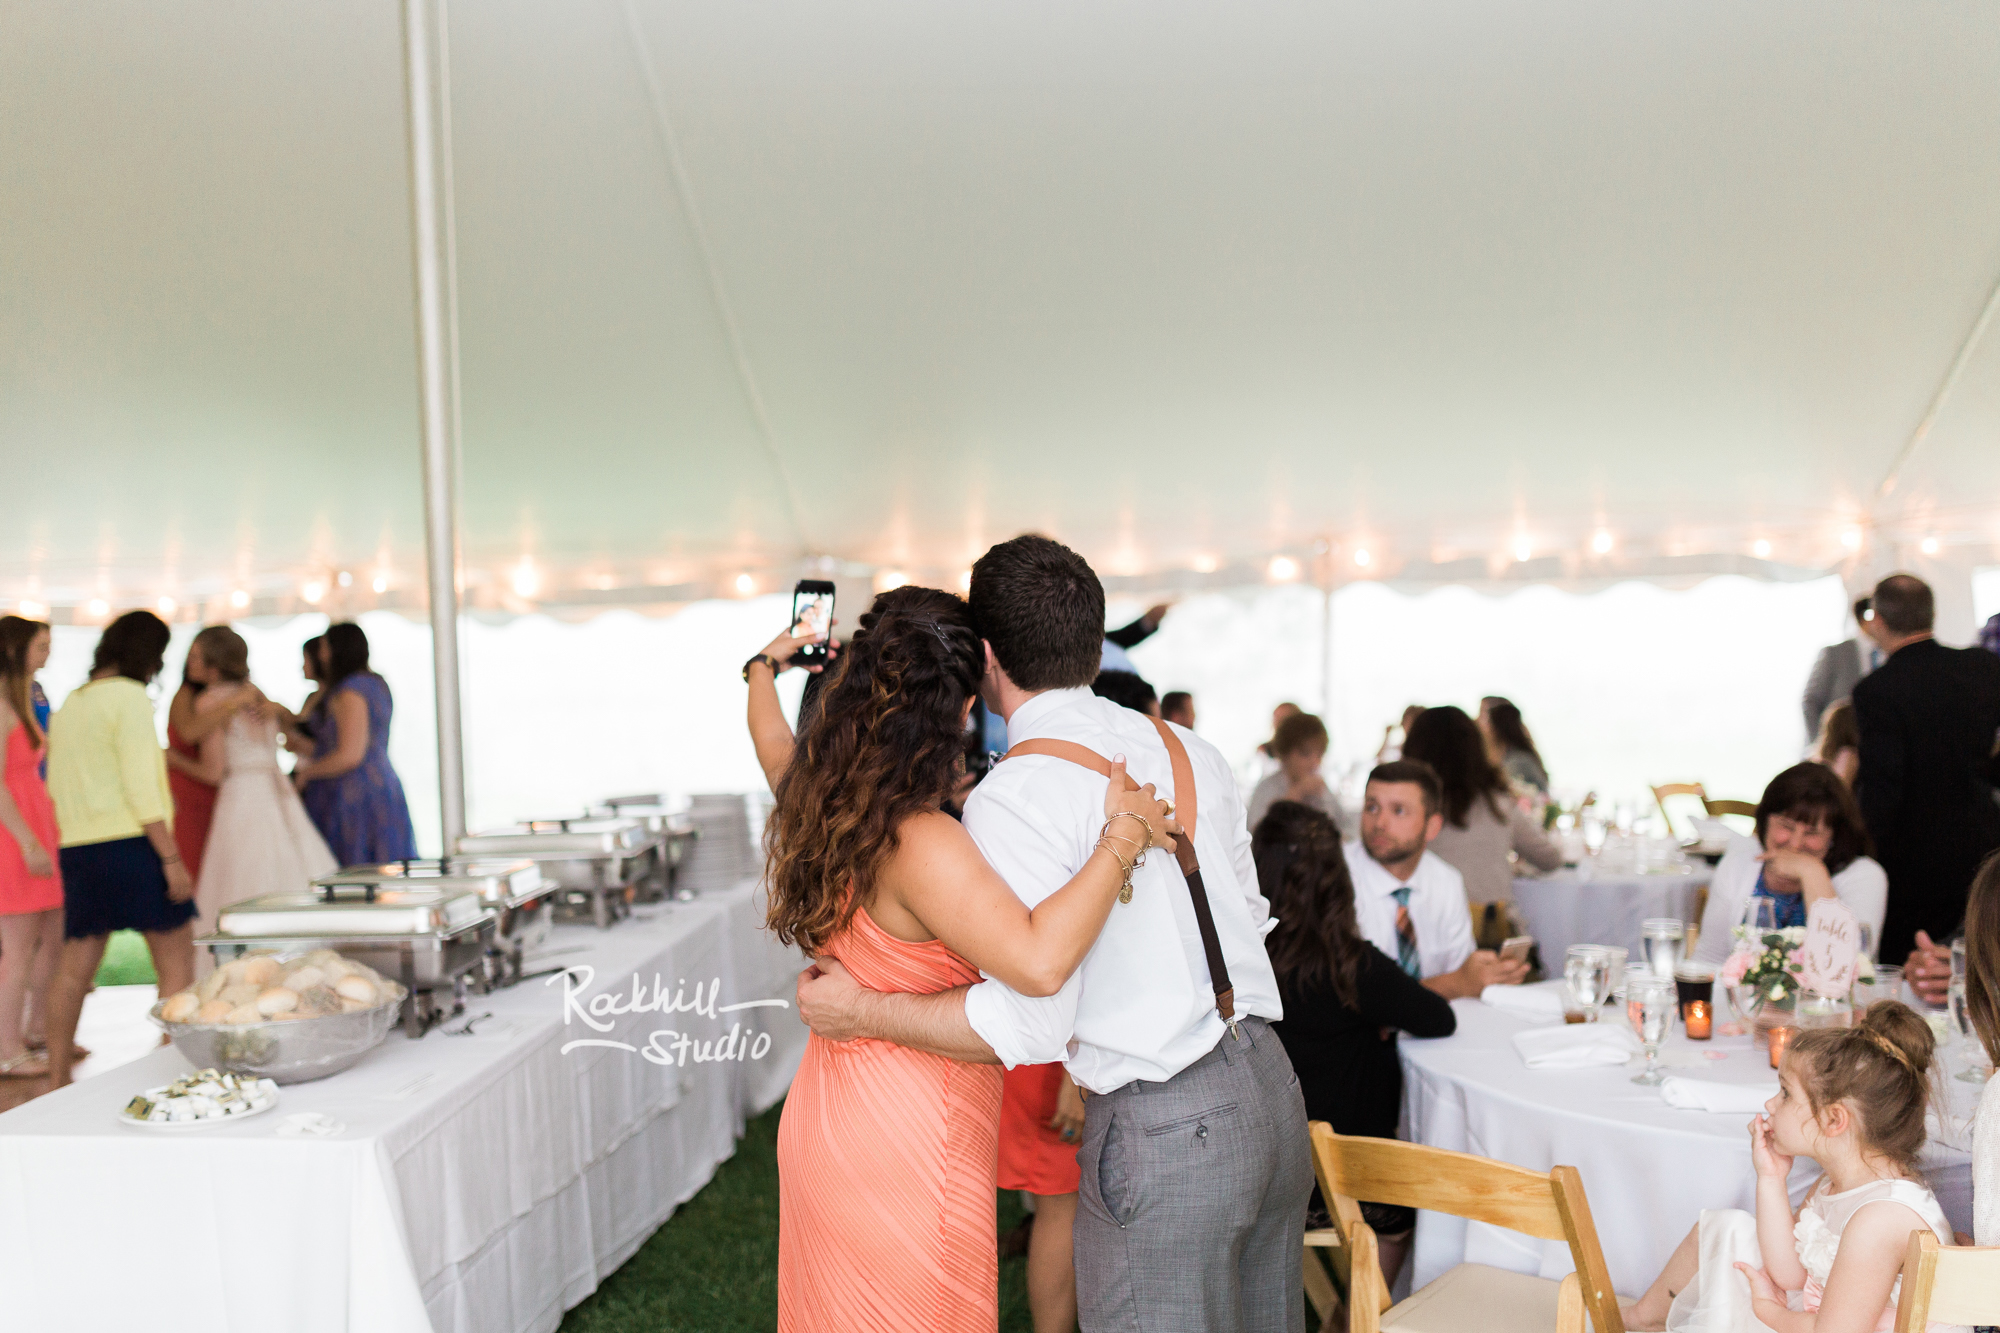 marquette-michigan-wedding-upper-peninsula-spring-photography-rockhill-ee-59.jpg